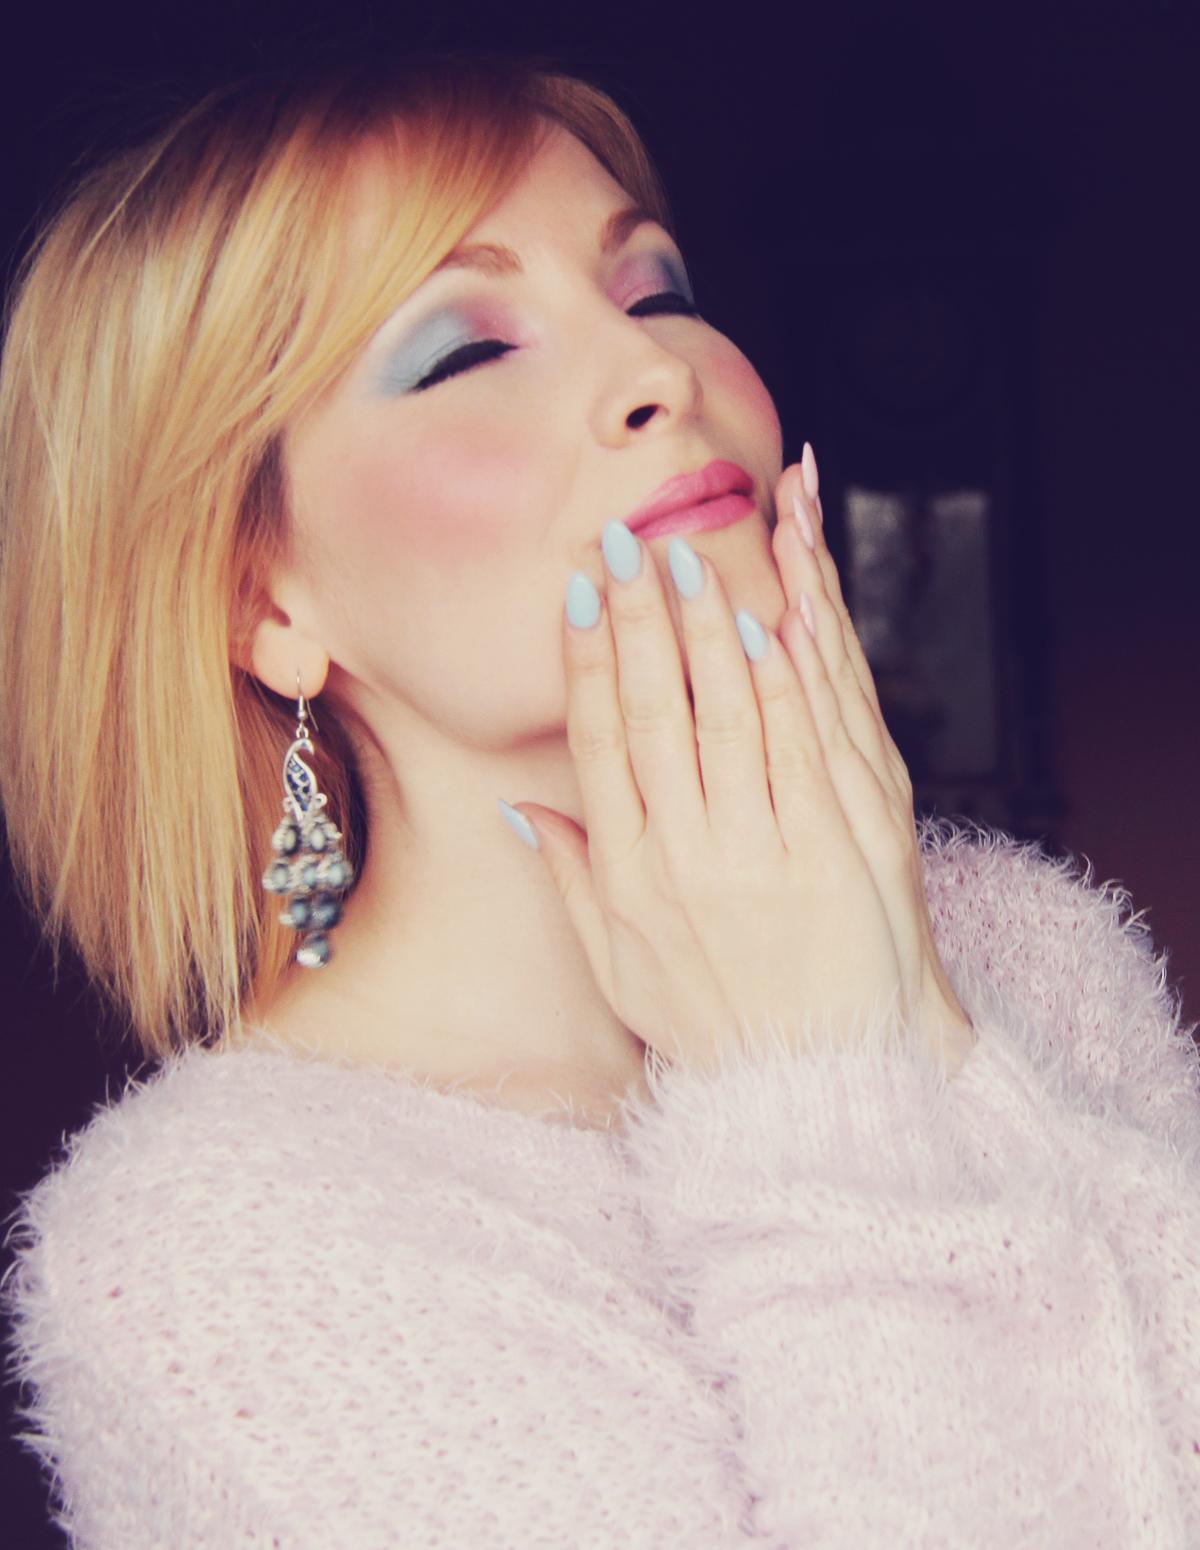 rose quartz and serenity make-up and rose quartz and serenity nails